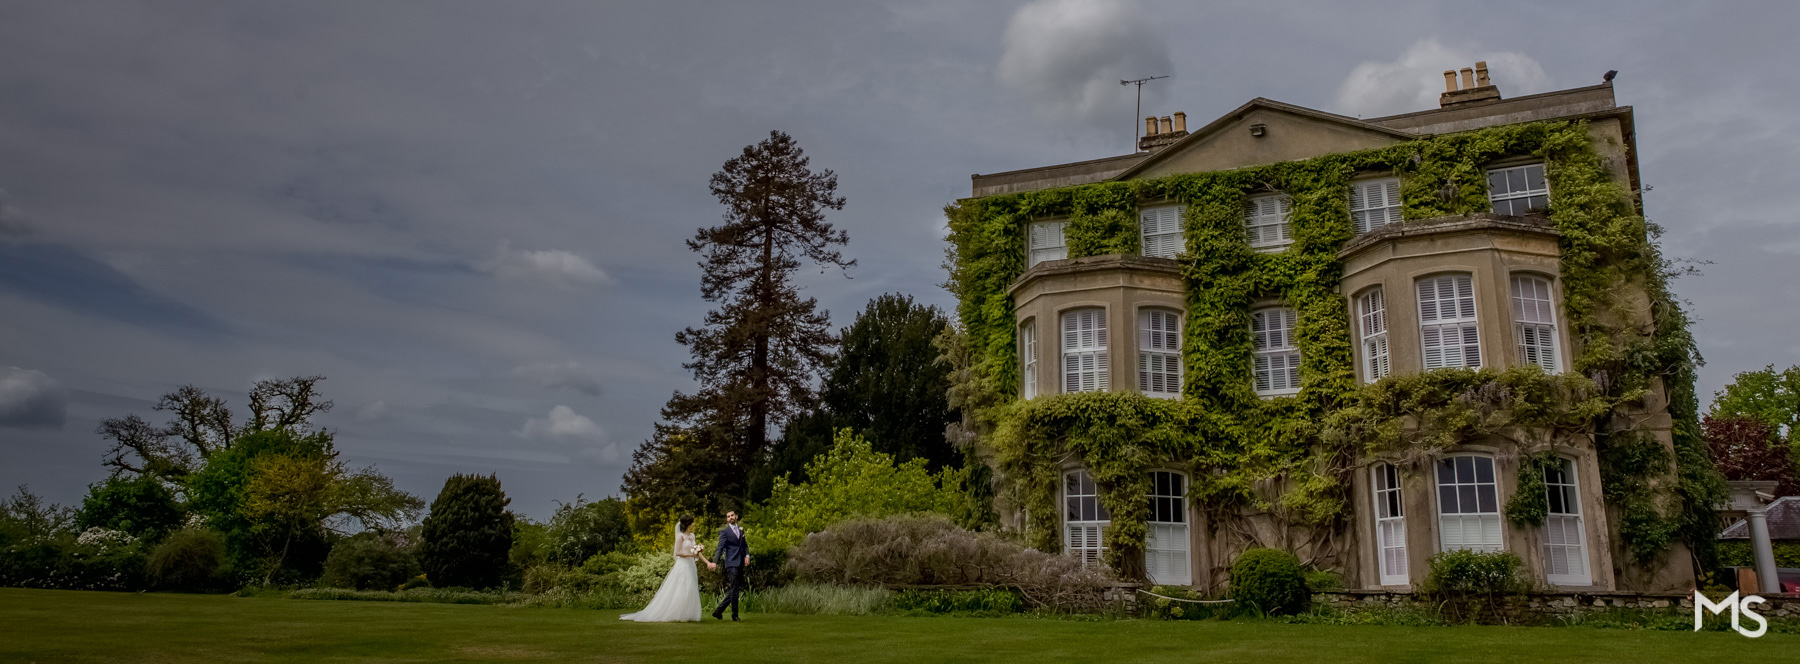 Northbrook Park Asian Wedding Photography